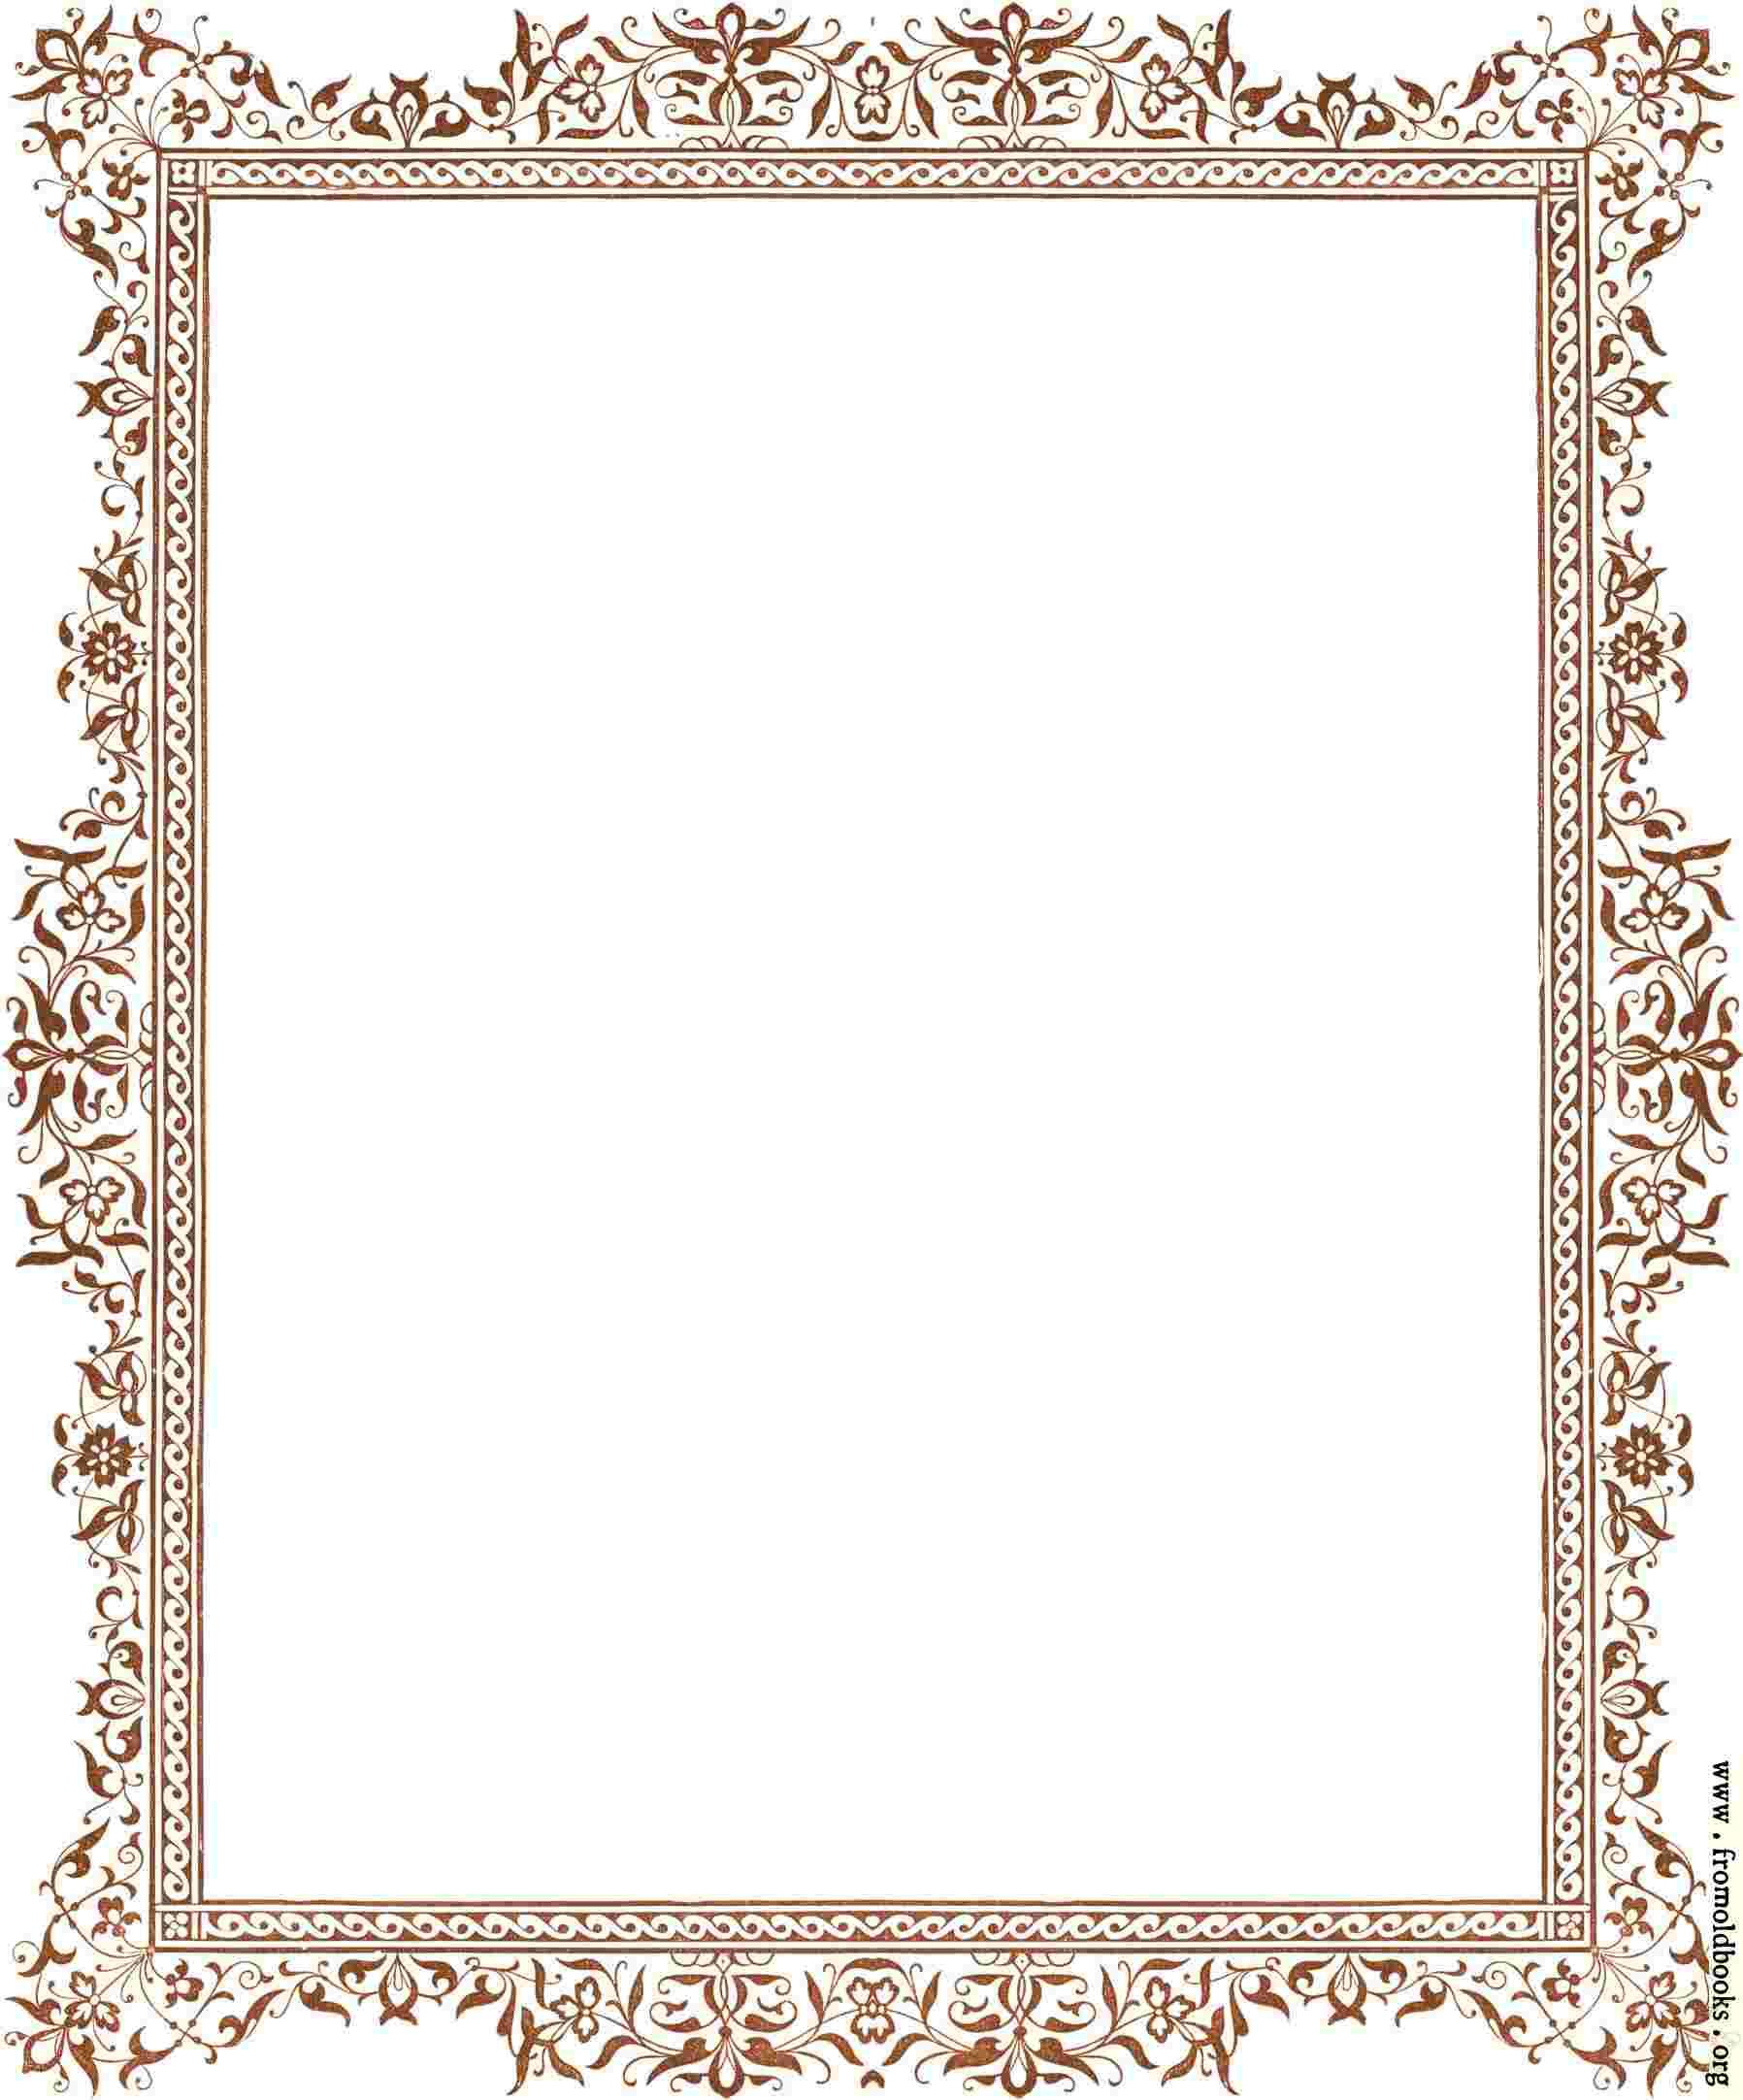 Cliparts Library: Antique Border Clipart Leafy Clip Art.